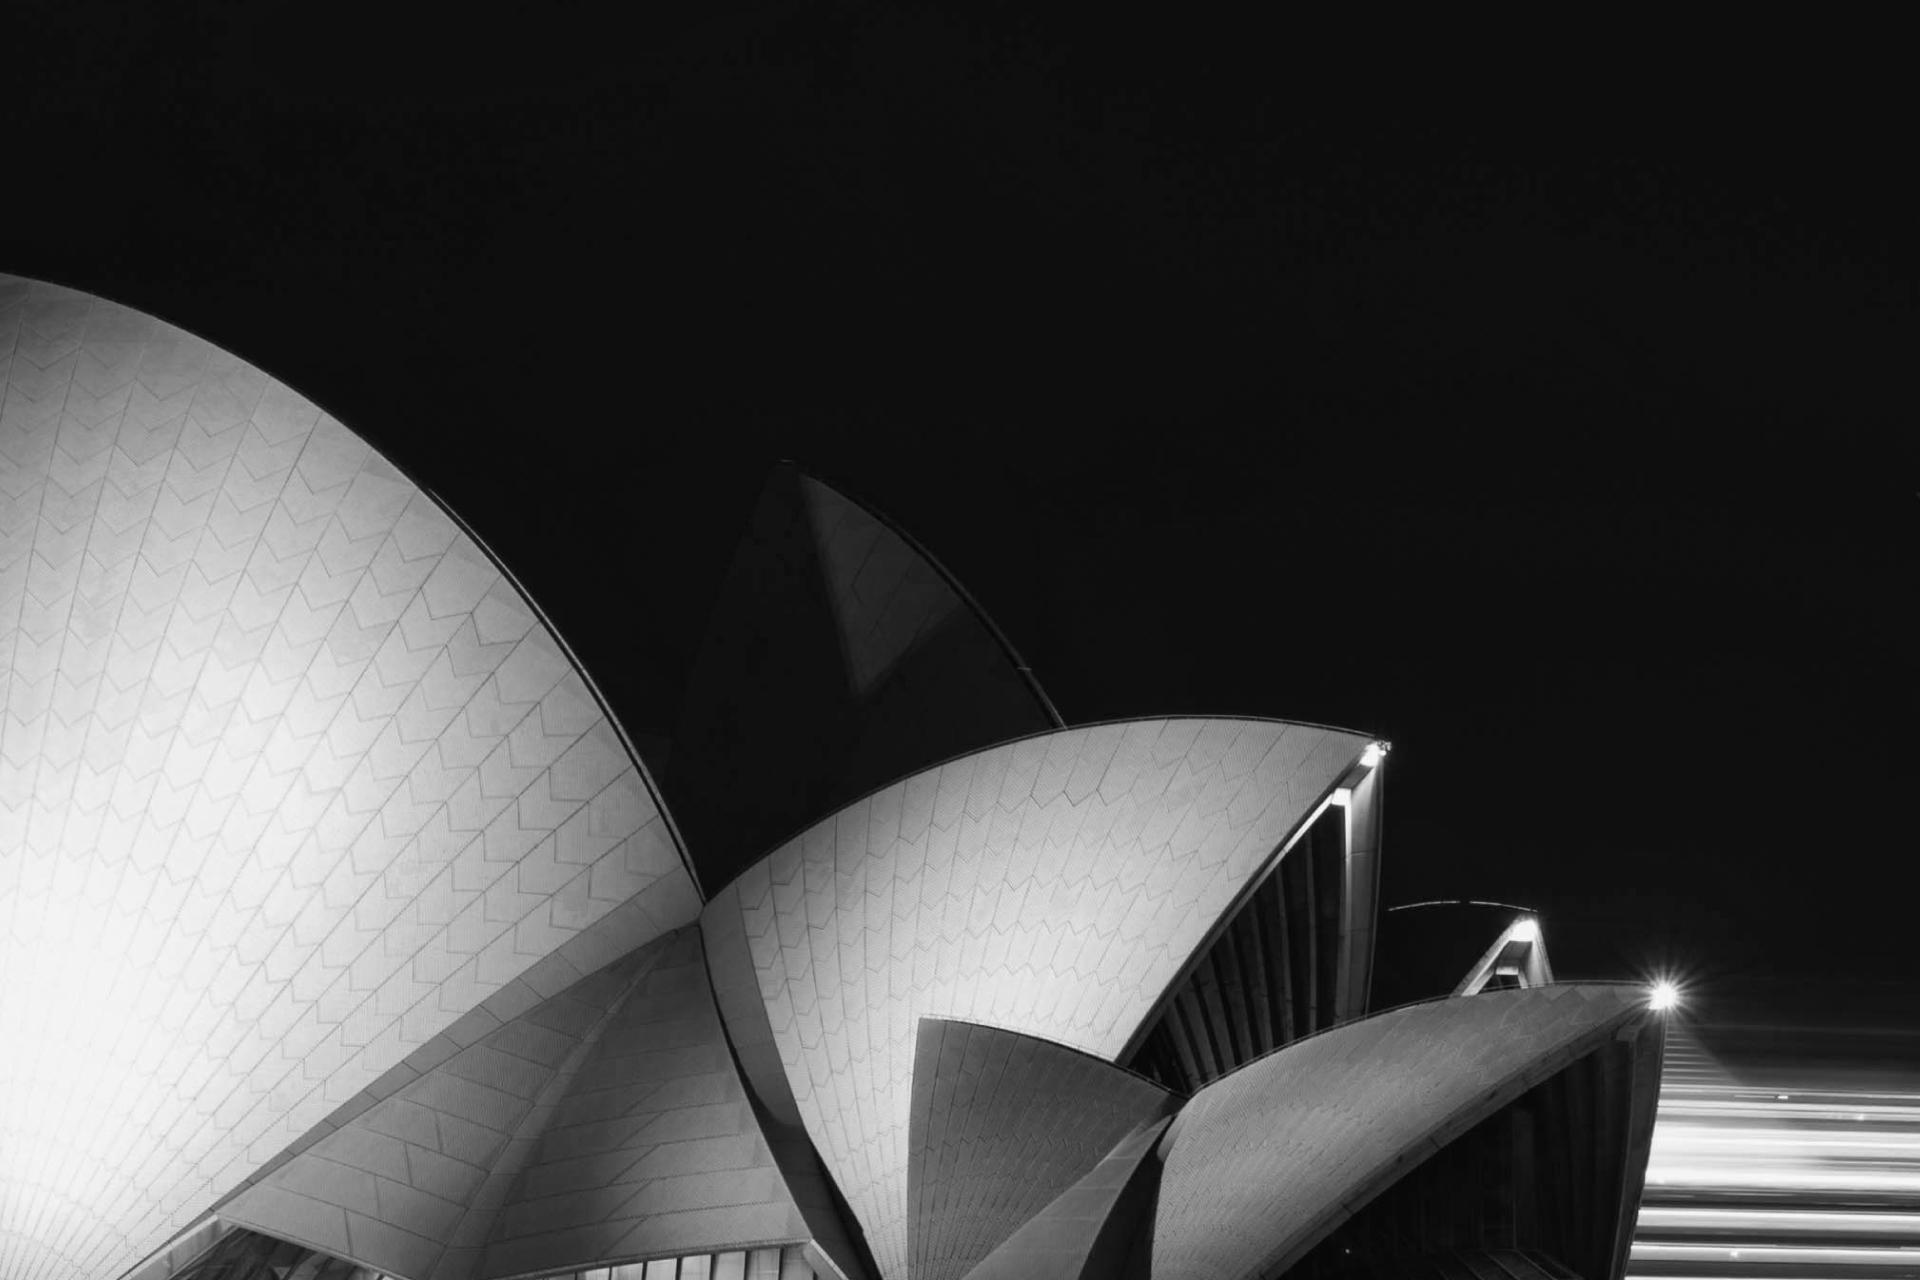 TomCarey_SydneyOperaHouse_1.jpg